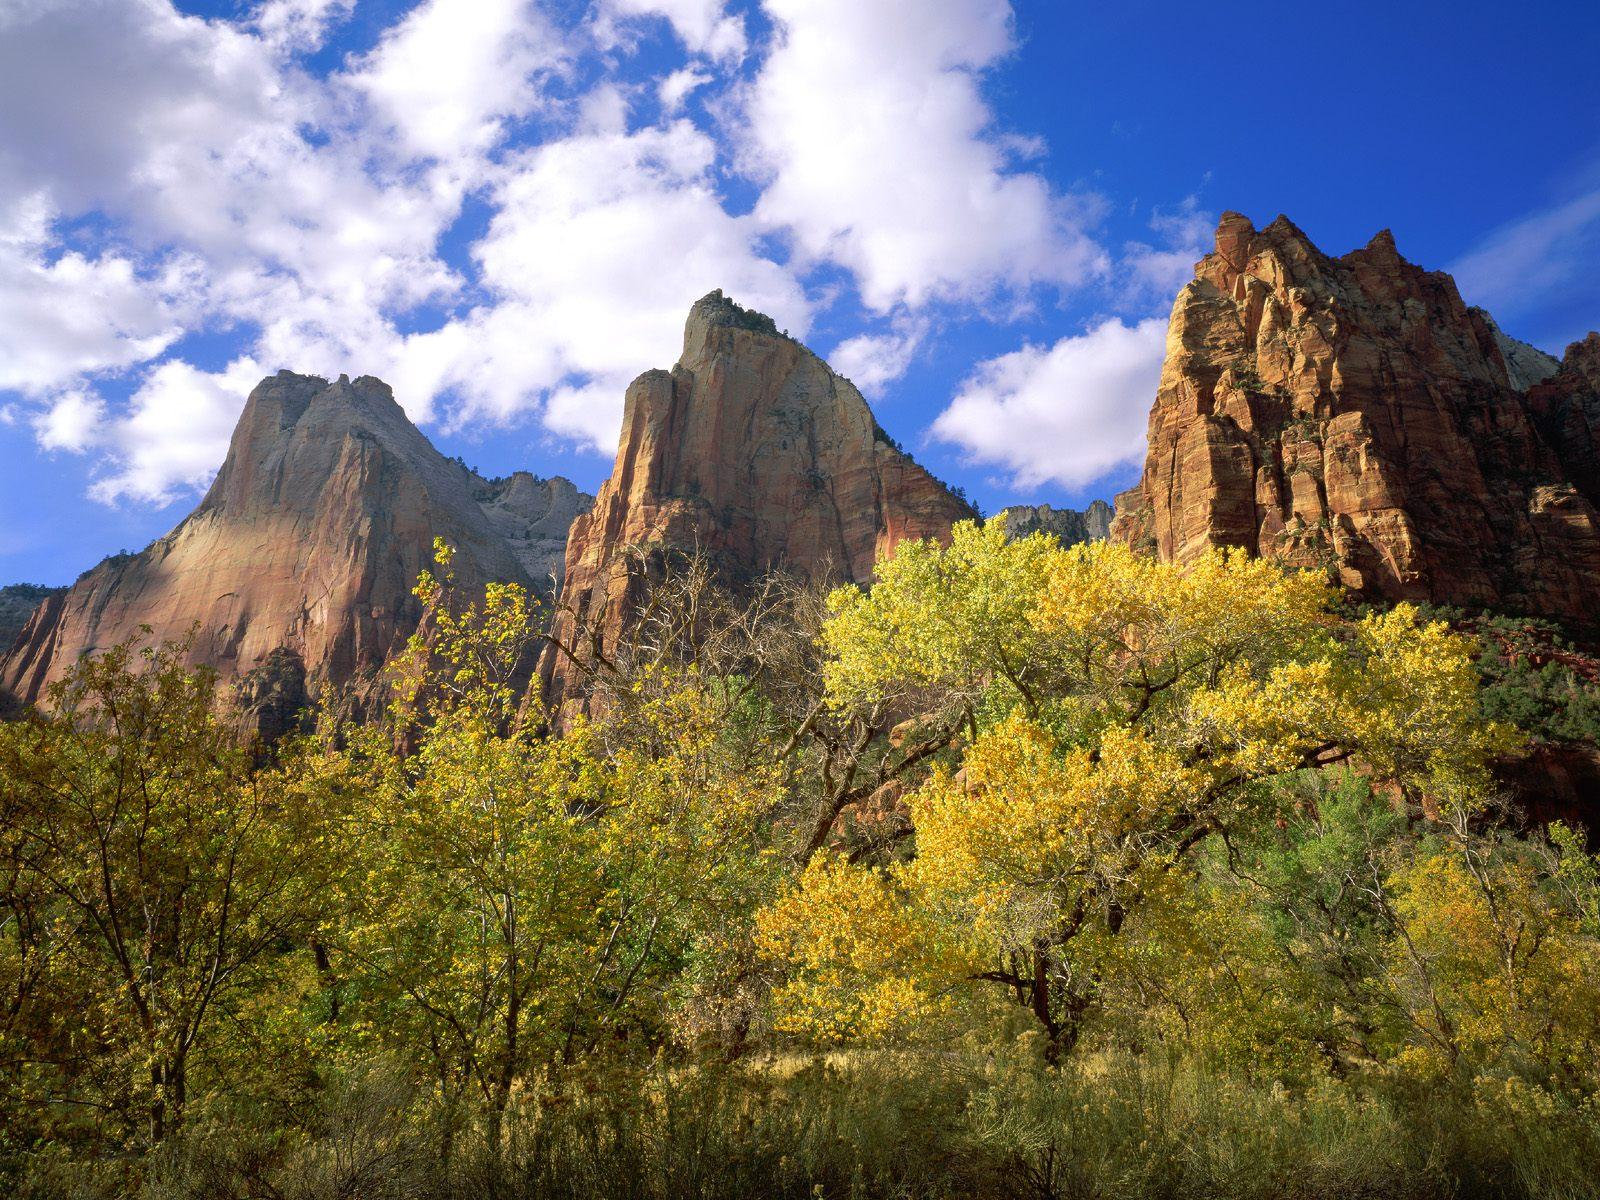 Sfondi di paesaggi sfondissimo sfondi screensaver gratis for Sfondi paesaggi bellissimi